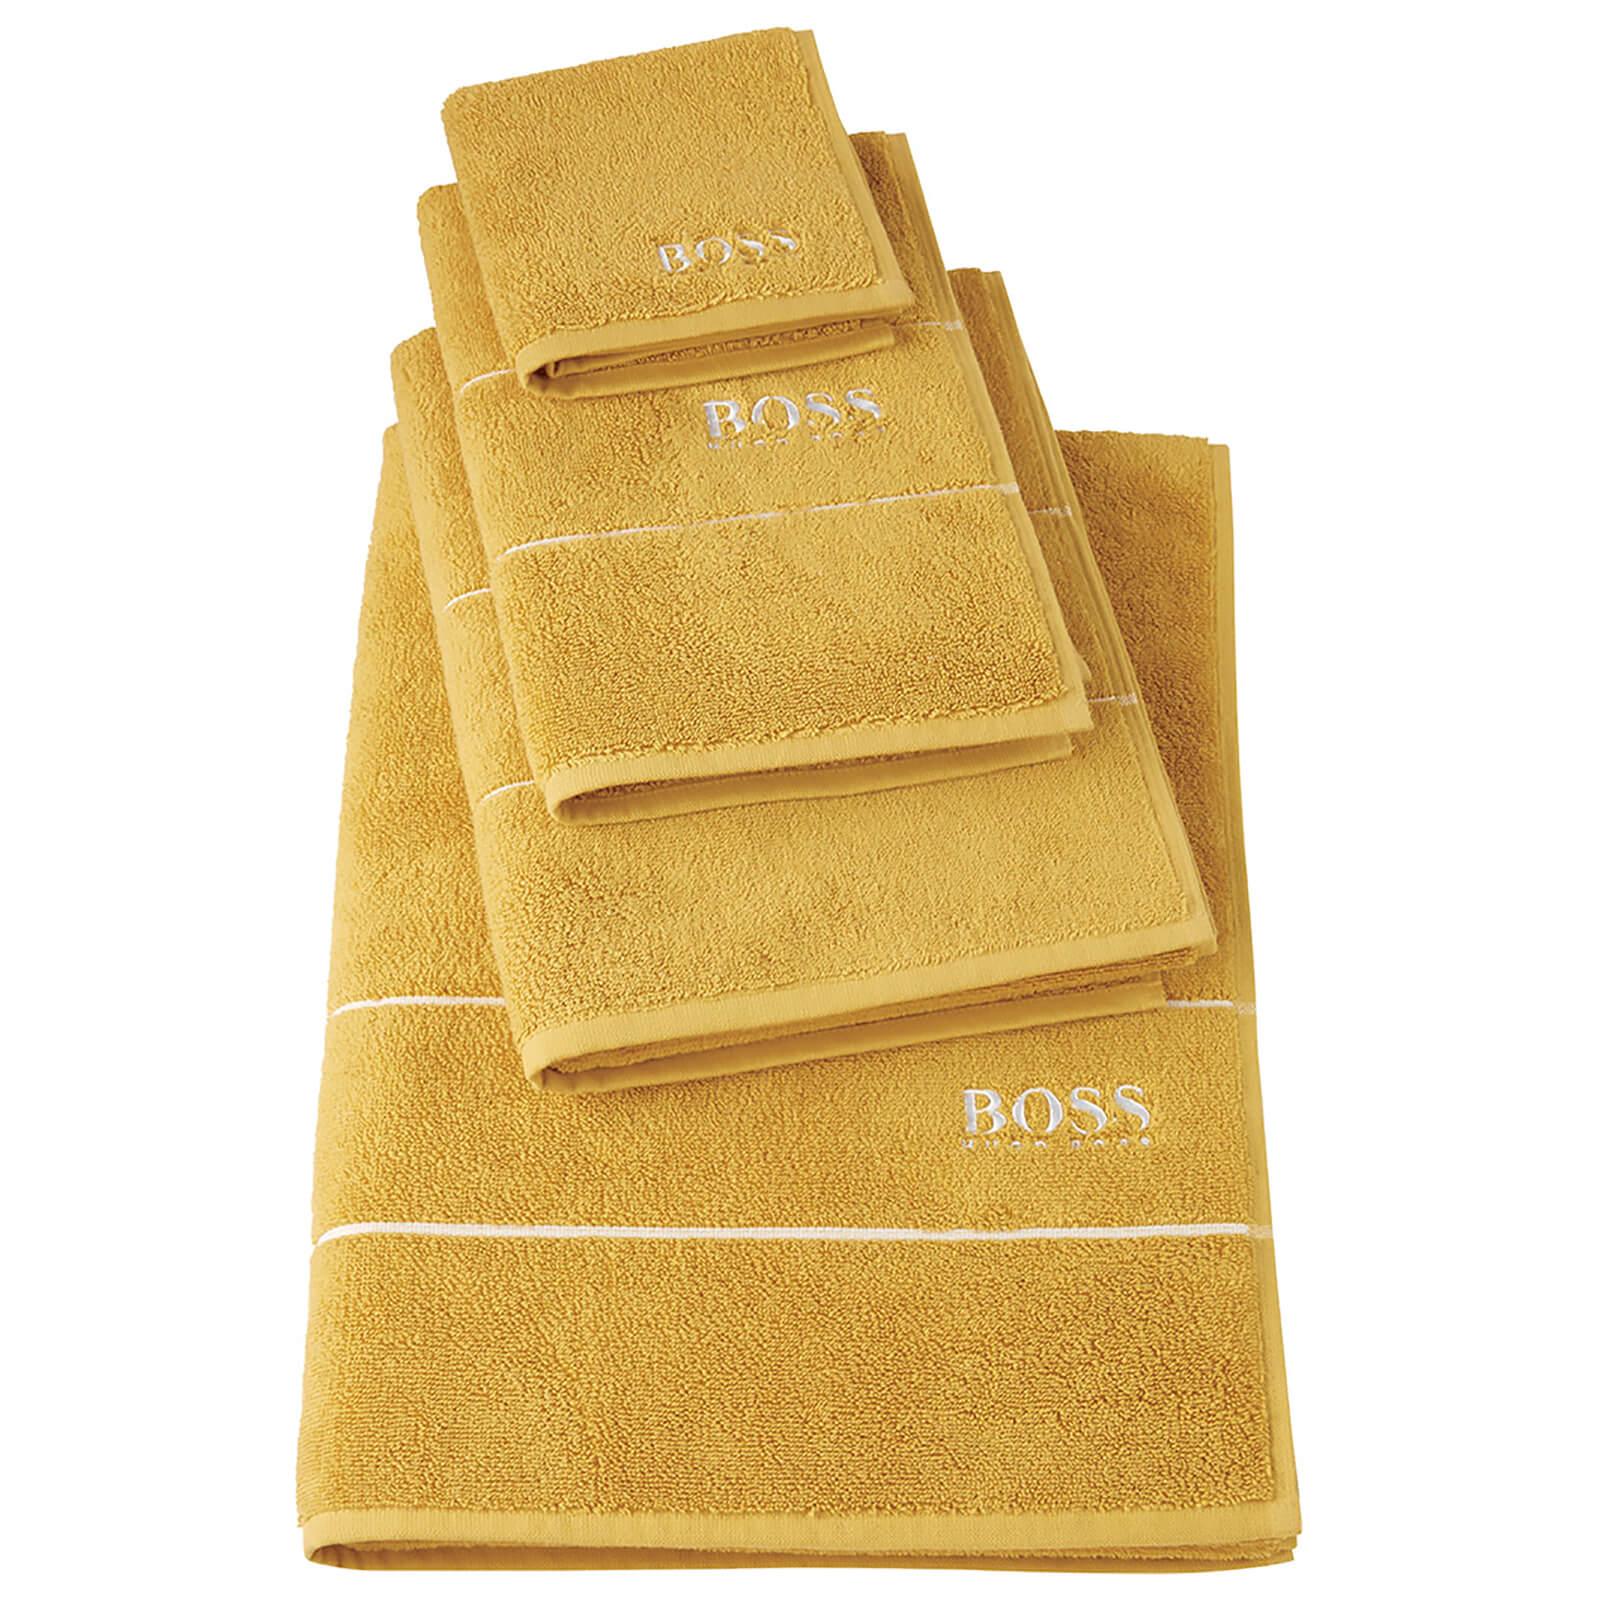 Hugo Boss Plain Towels - Topaz - Bath Sheet - Yellow